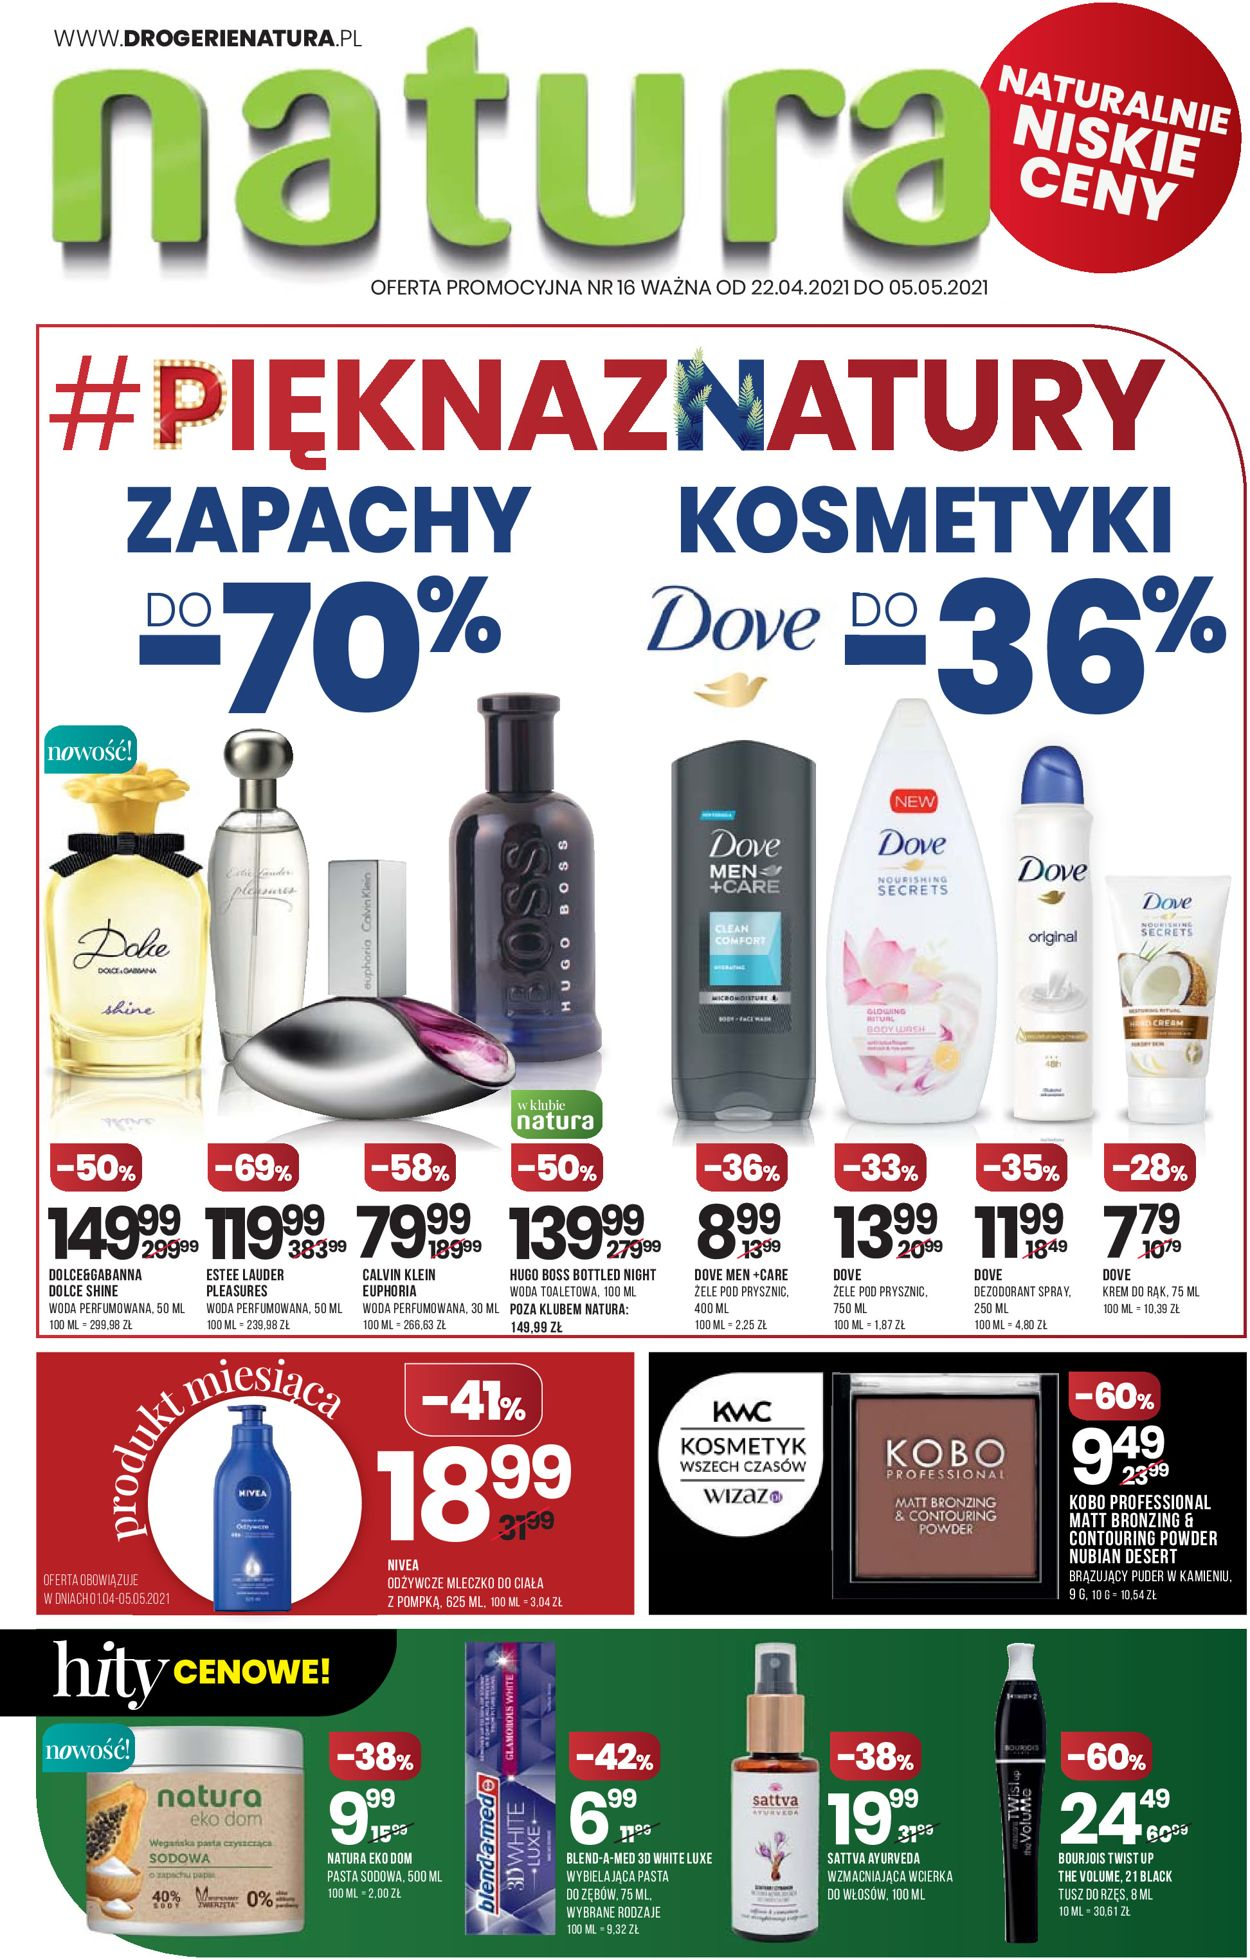 Gazetka promocyjna Natura - 22.04-05.05.2021